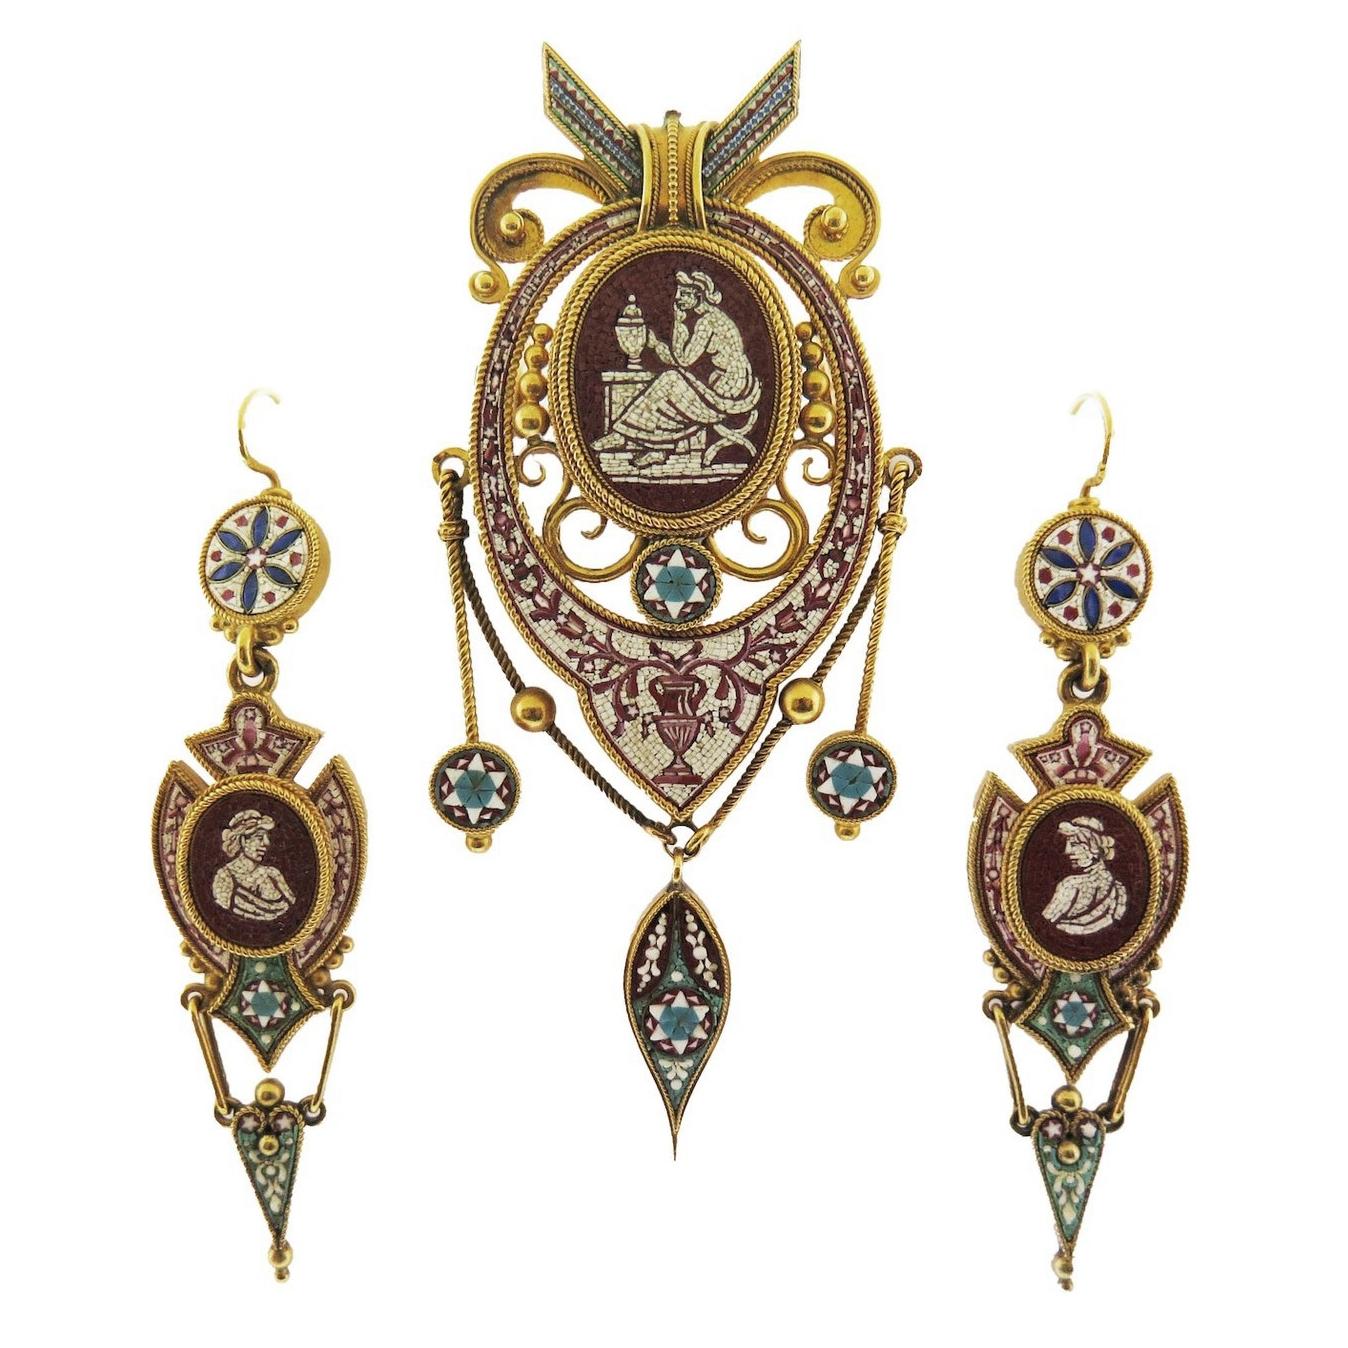 Micro Mosaic Set - Brooch and Earrings